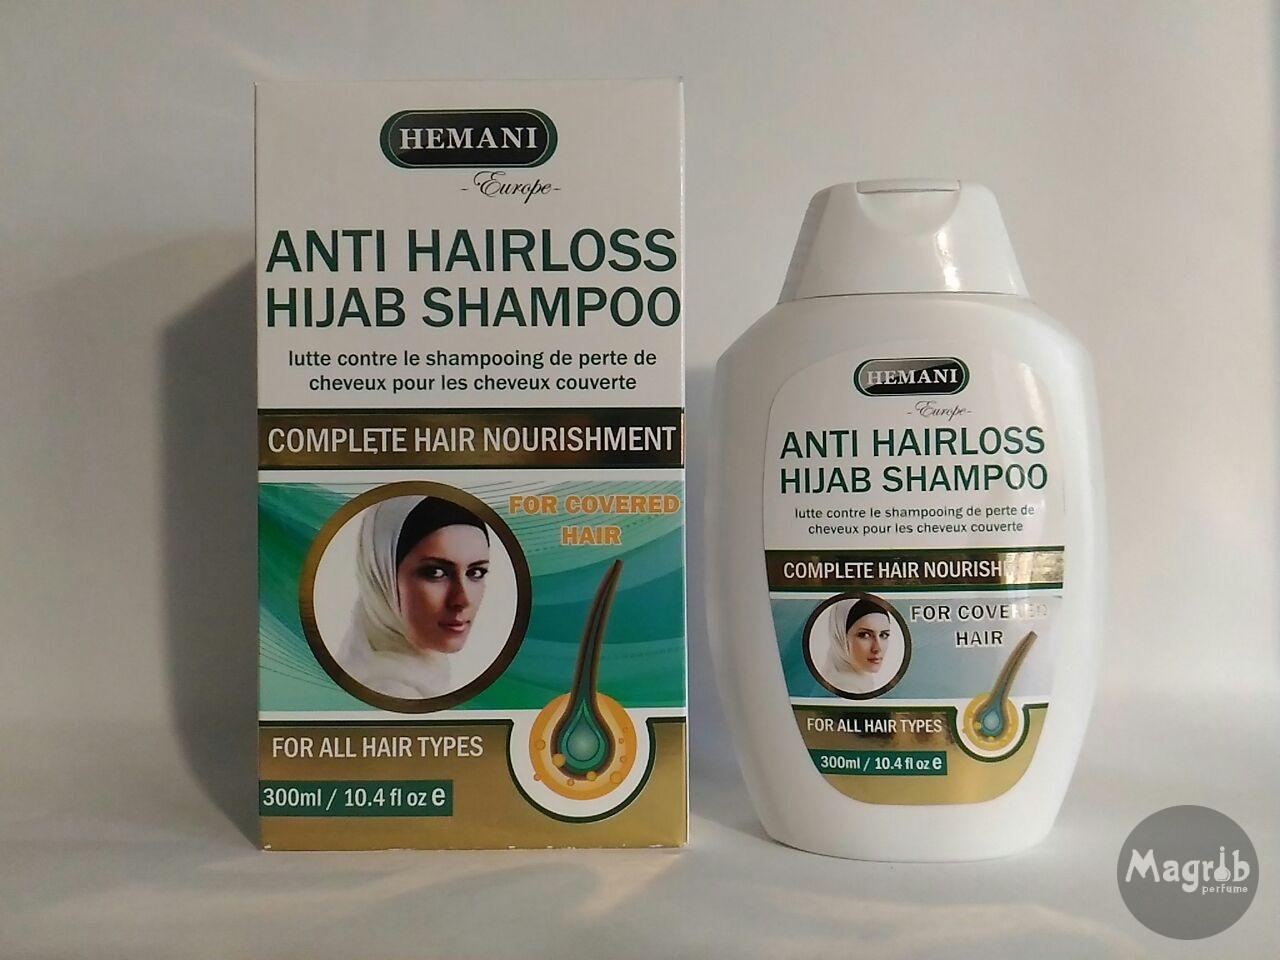 Hemani Anti Hairloss Hijab Shampoo 300ml- шампунь под хиджаб (против выпадения волос).